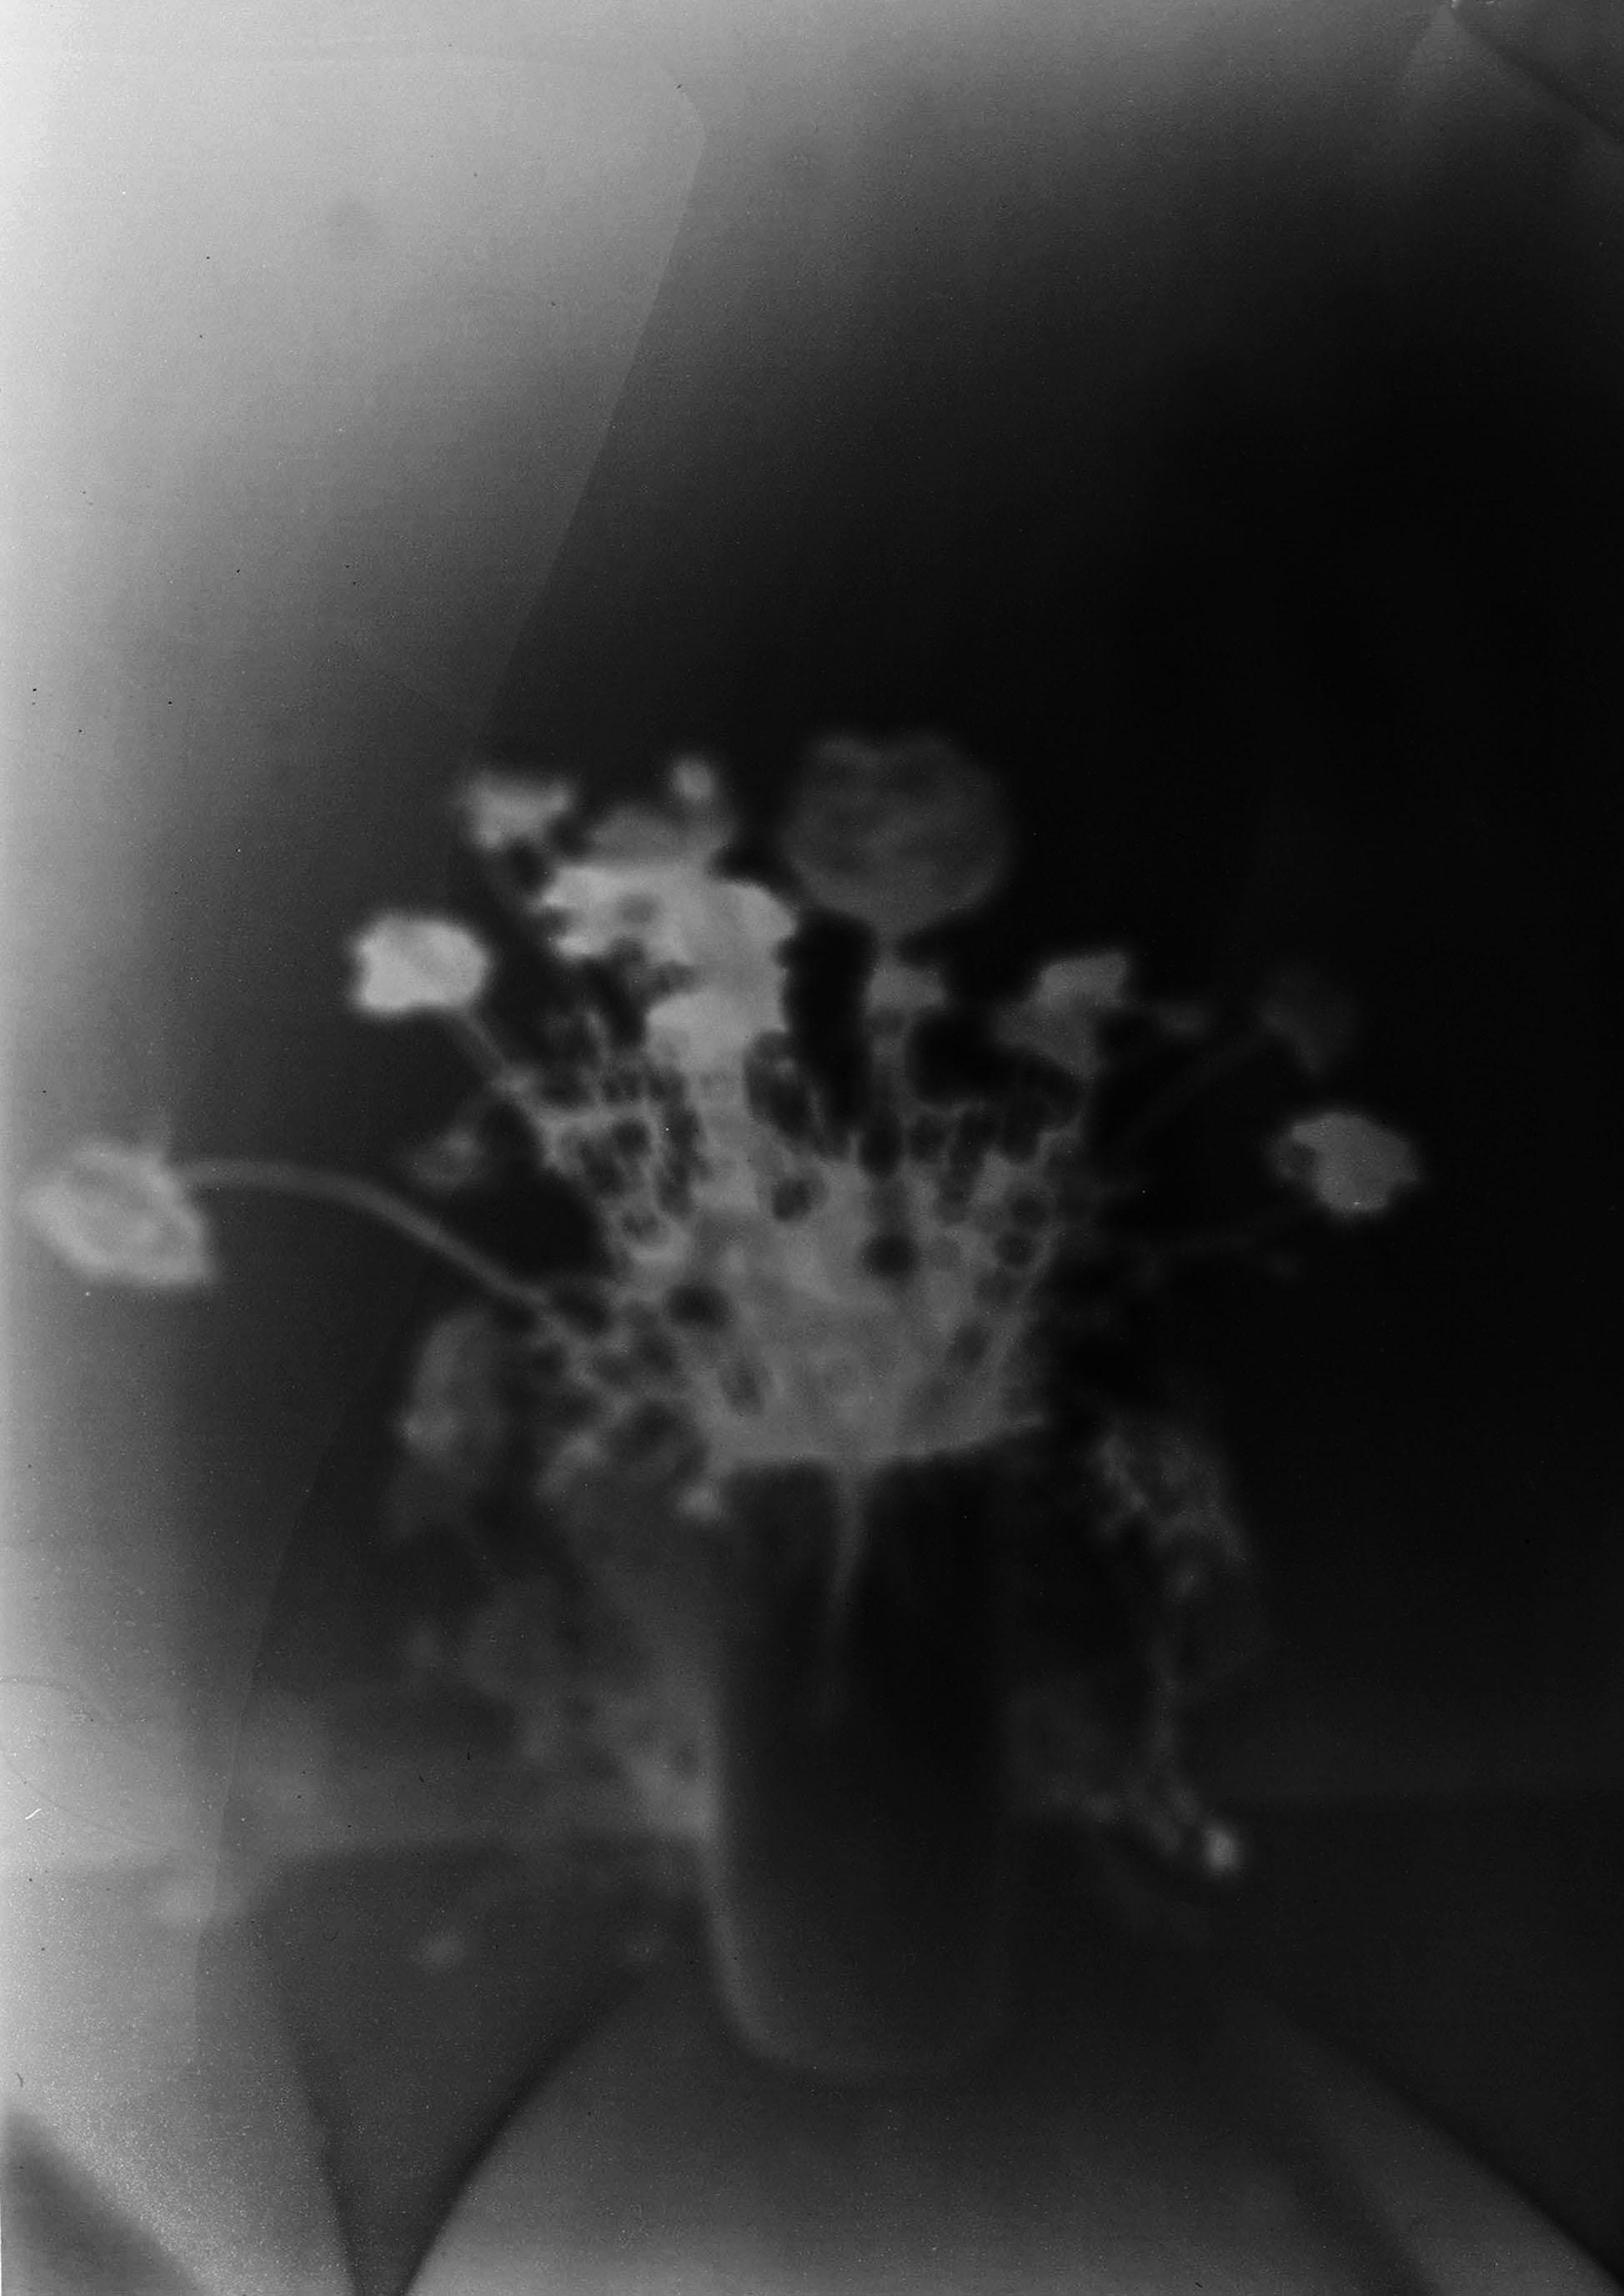 'Blumen II', 2011/15, Pinhole photograph, laser-print on 180gsm cartridge paper, 12 x 18 cm